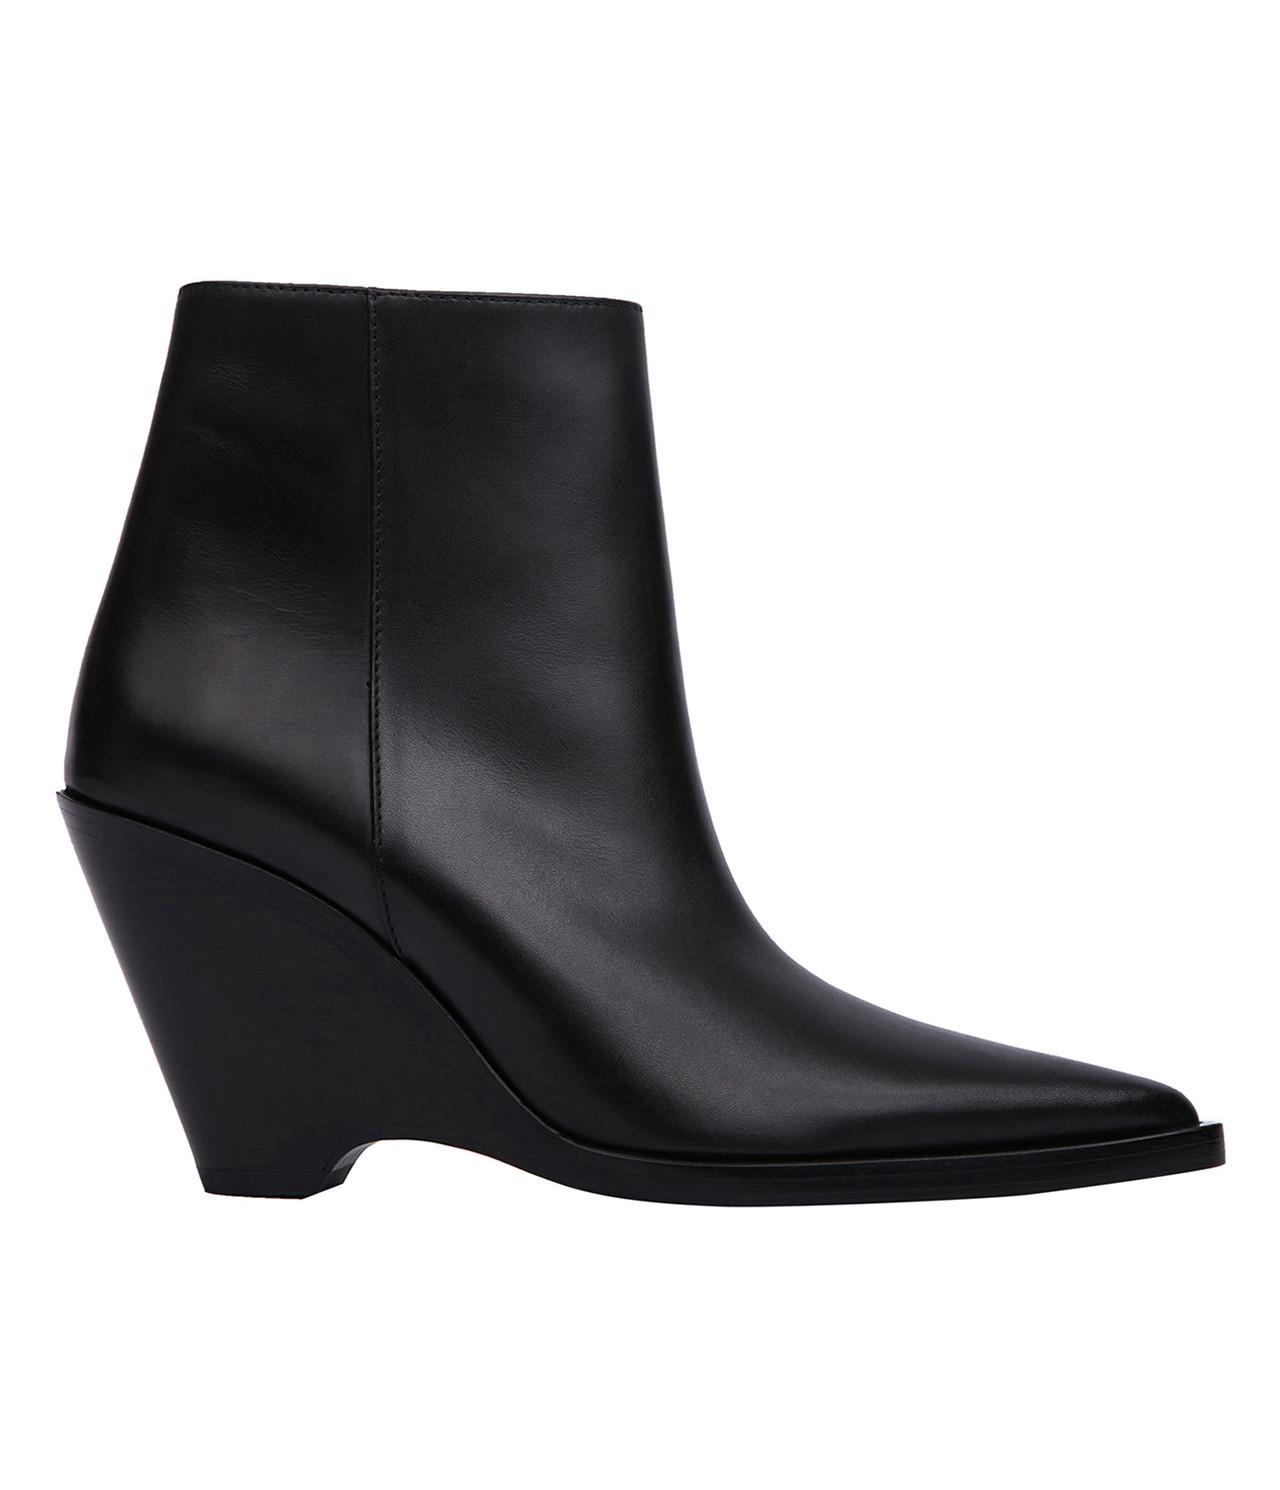 Acne Studios. Women's Black Caroline Ankle Boot